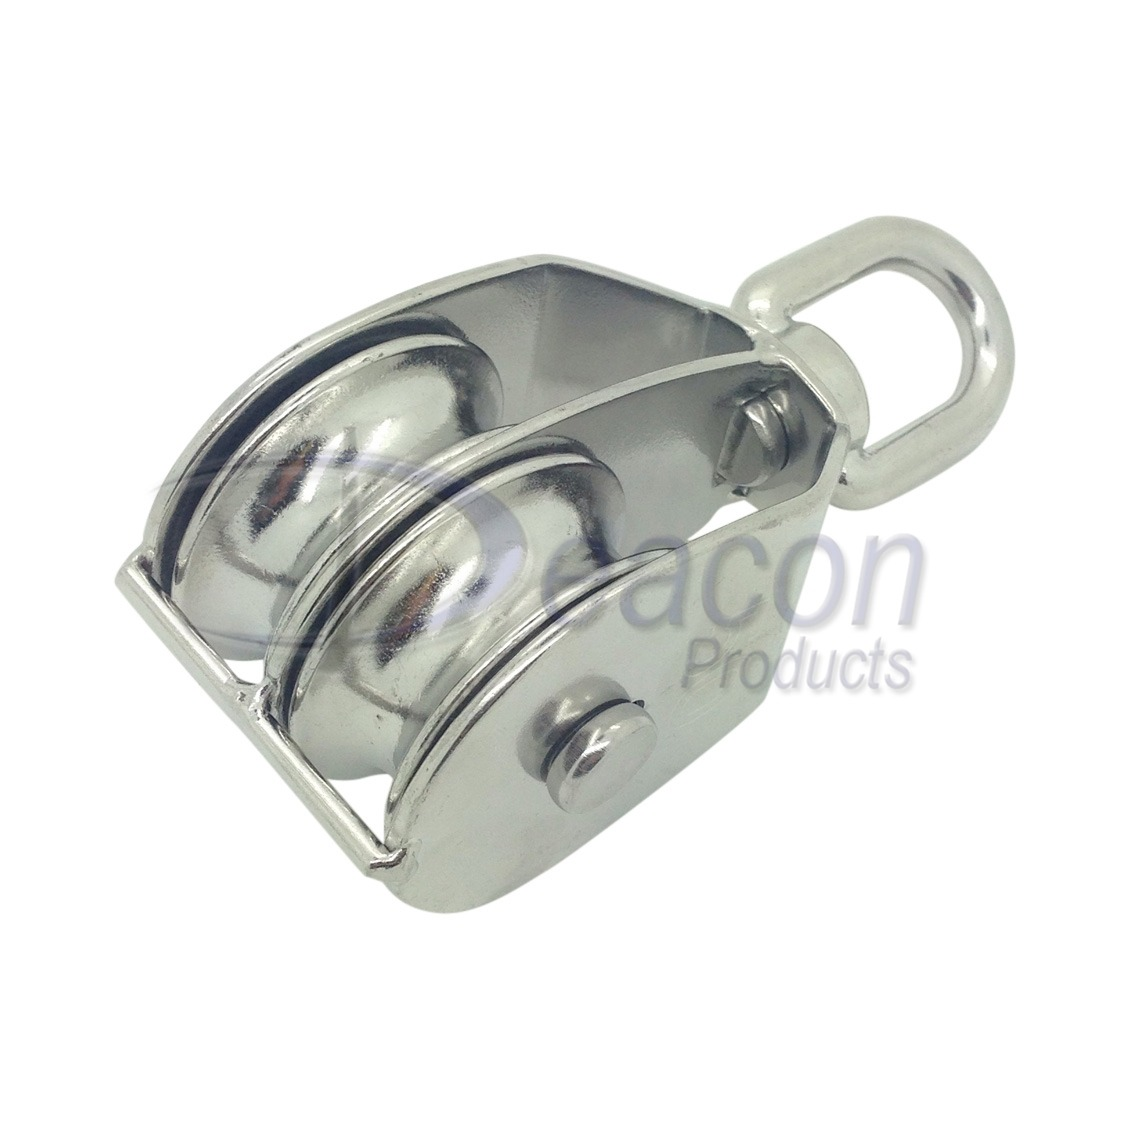 Stainless Steel Double Pulley Block With Swivel Eye – Deacon ...